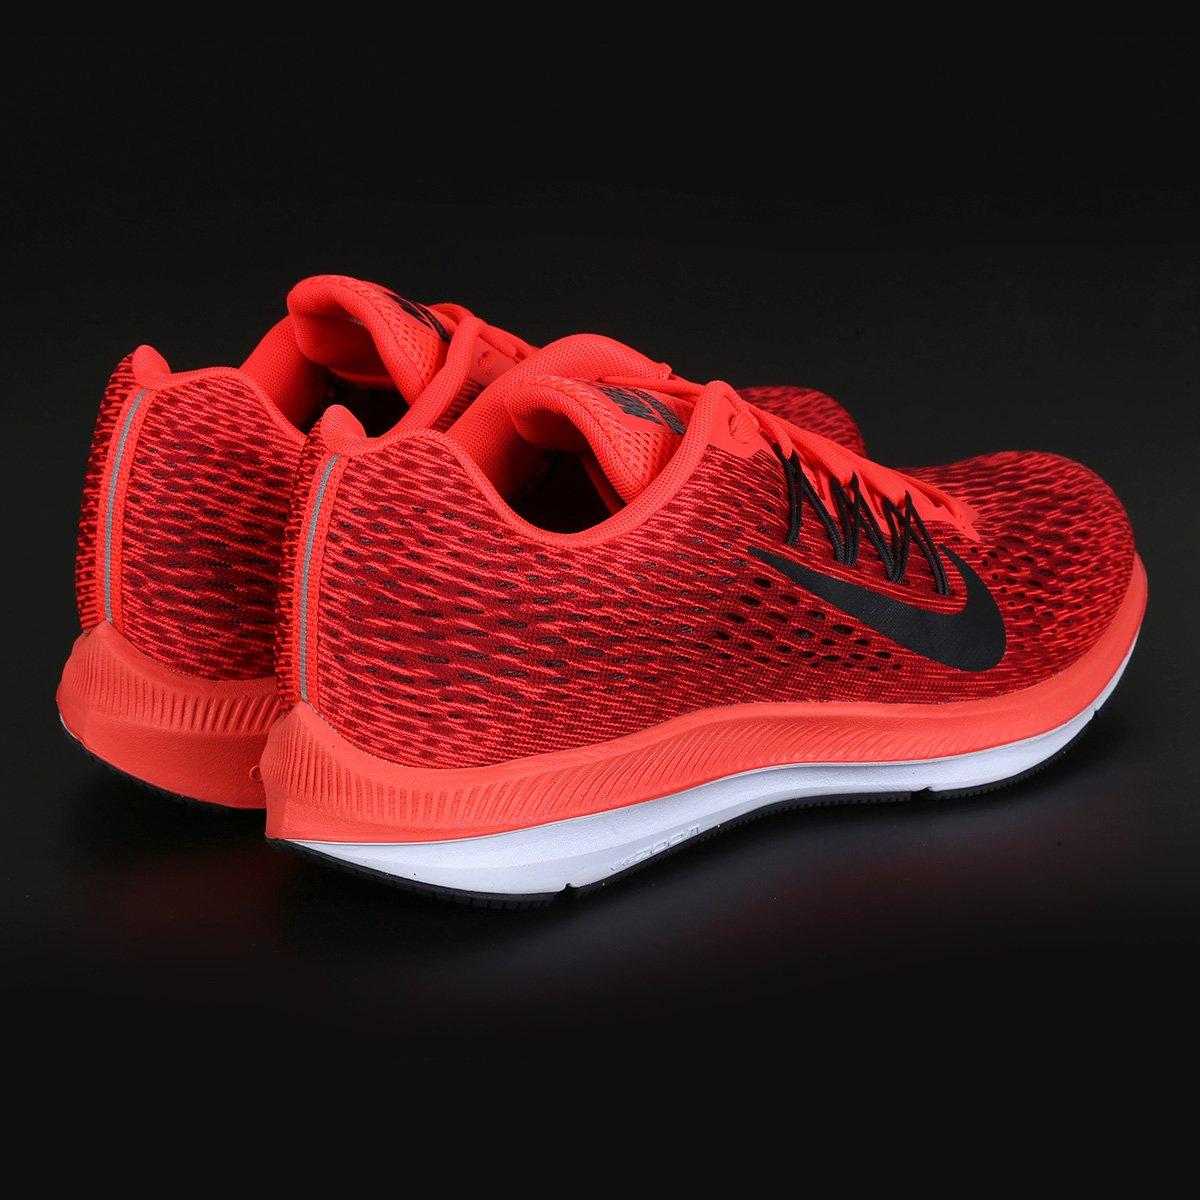 Zoom Masculino Tênis Tênis 5 e Winflo Nike Vermelho Nike Cinza q7FwtF